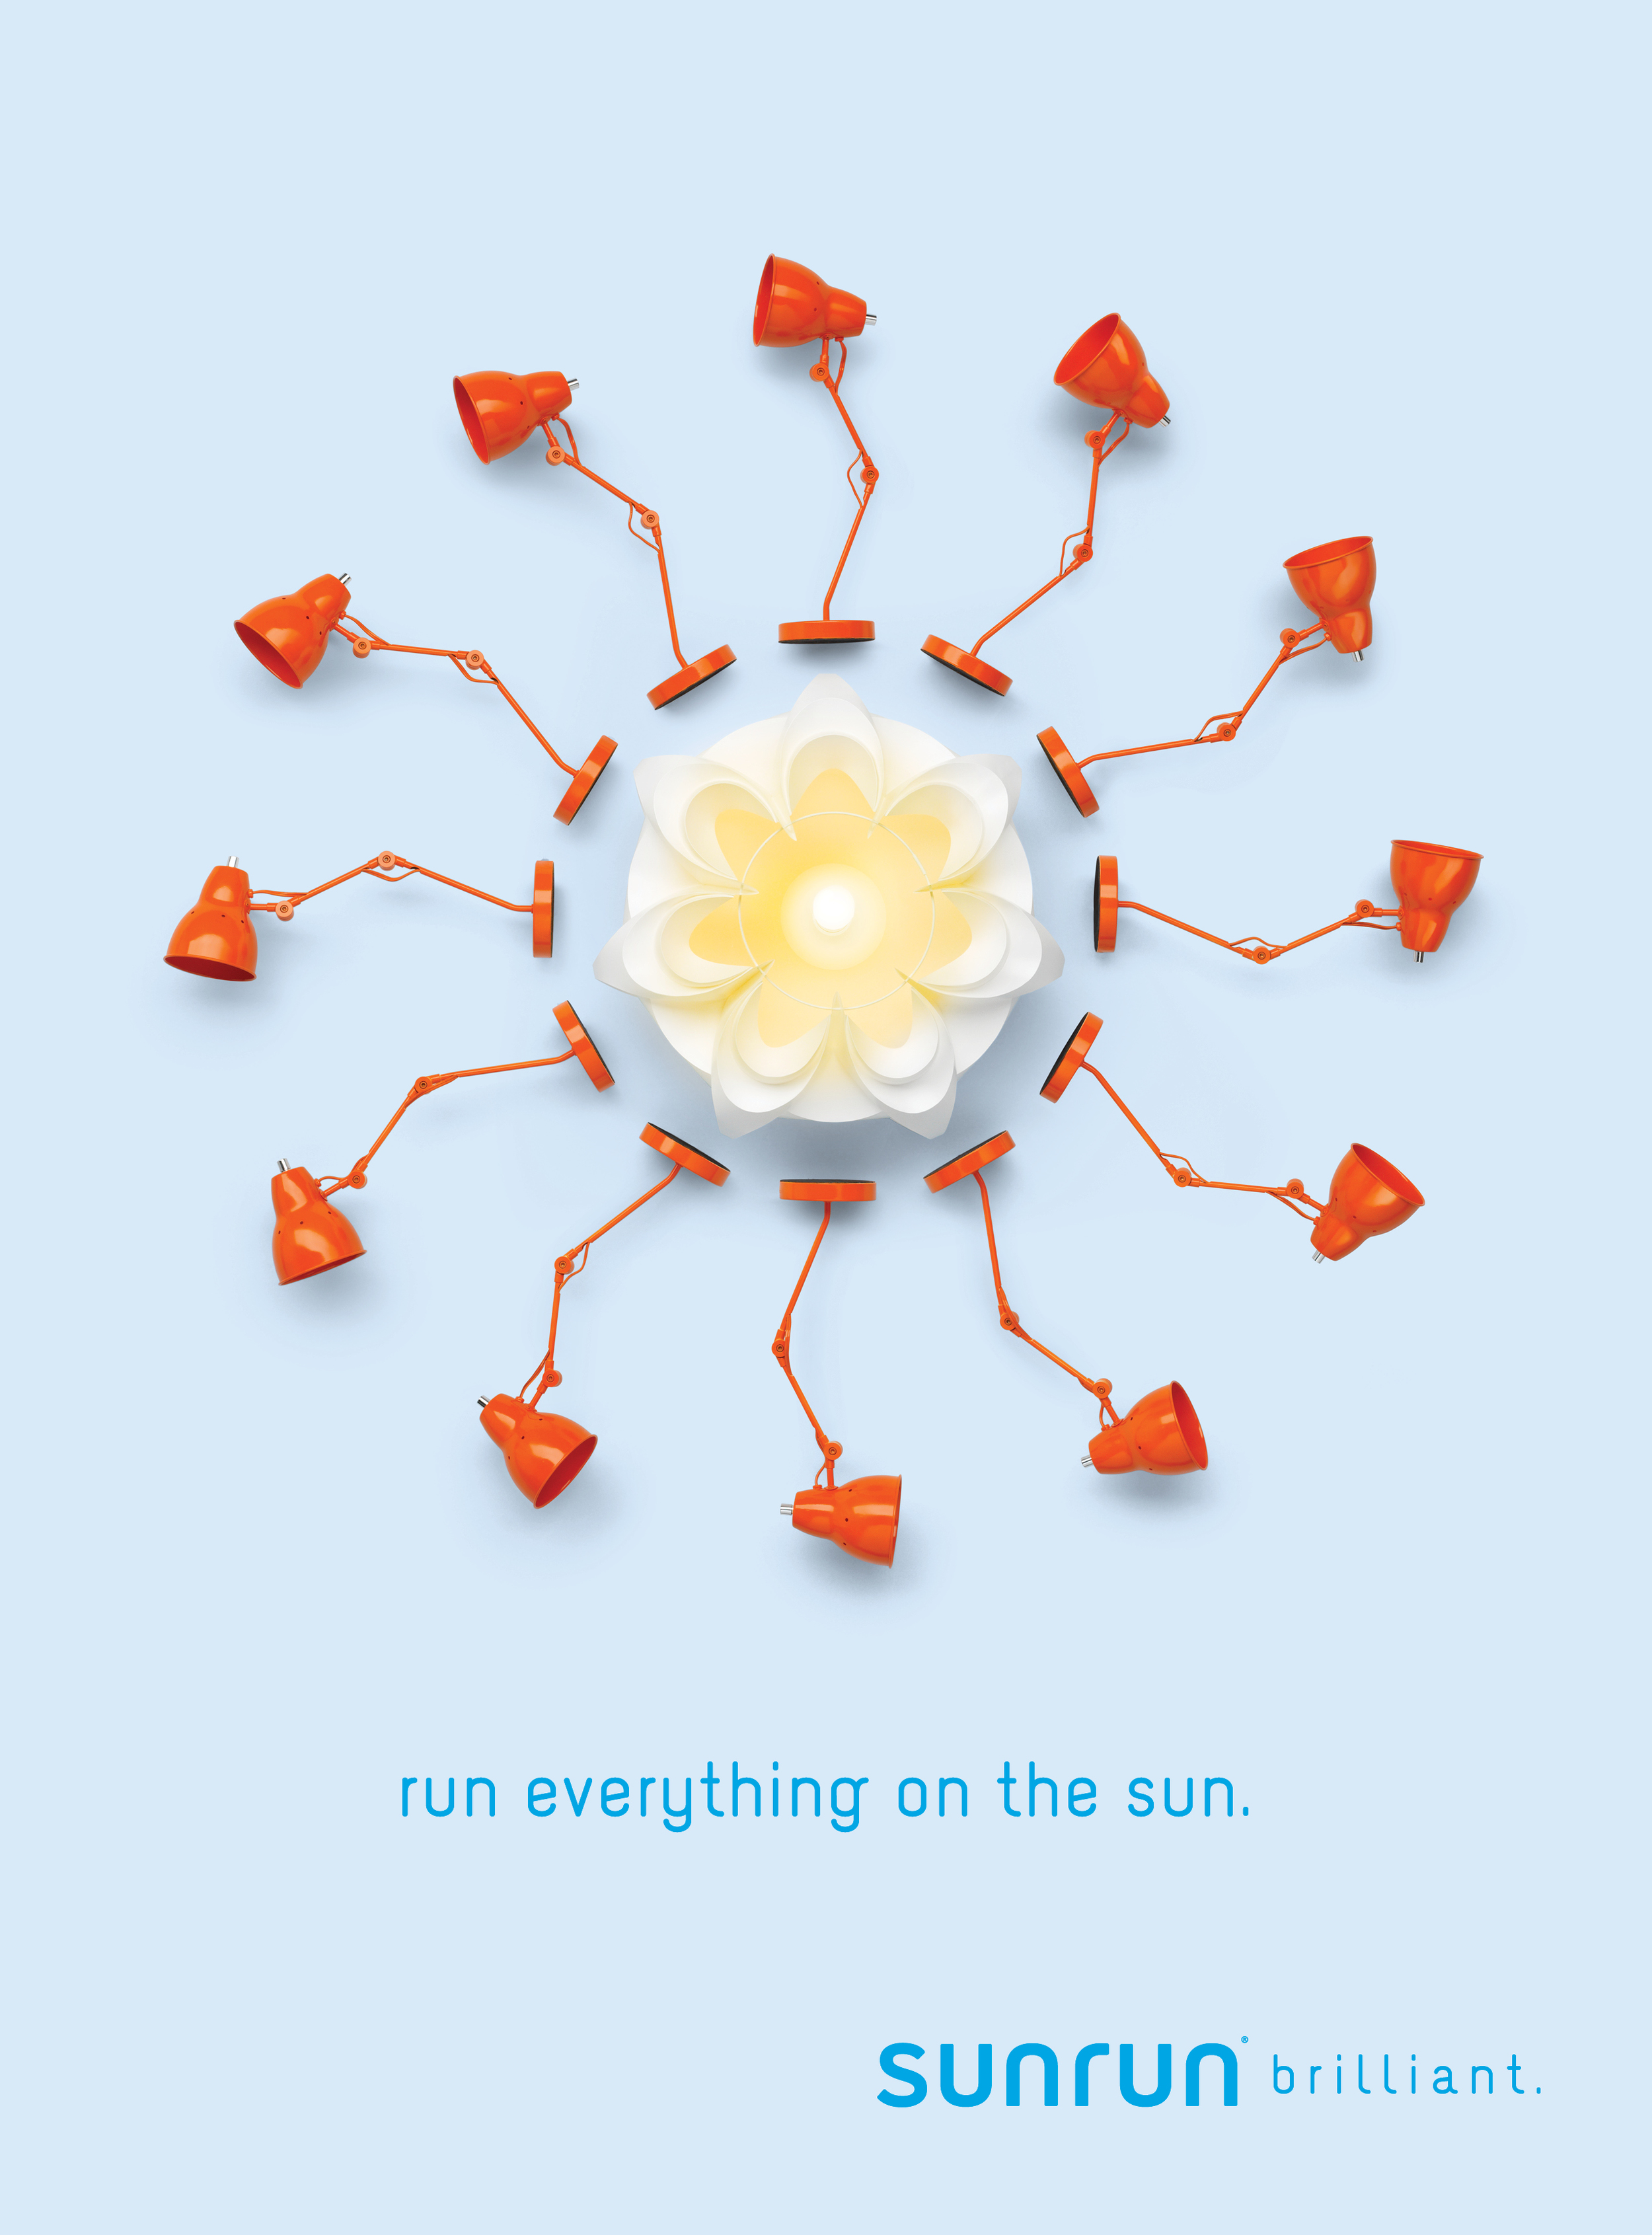 Sunrun-Brilliant-Eun-Everything-On-the-Sun-Lamps